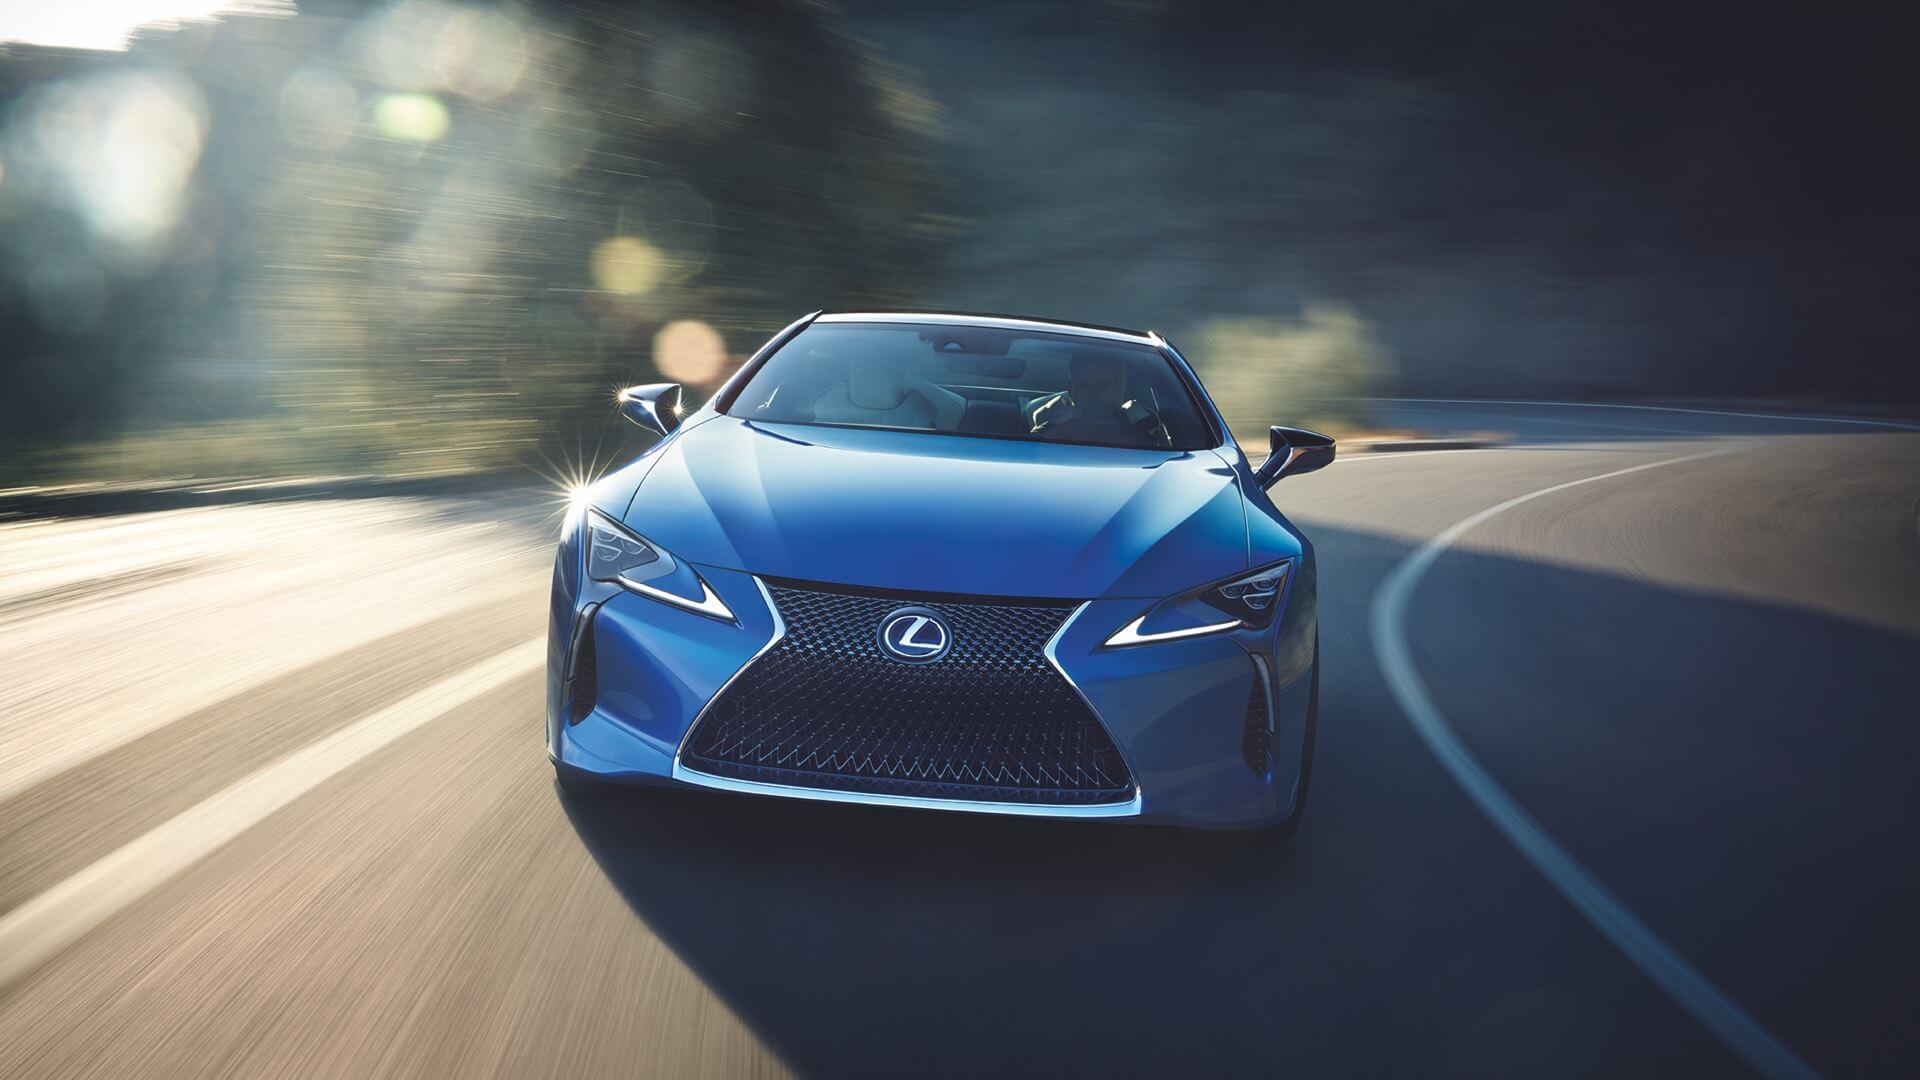 Lexus reforca alternativa digital